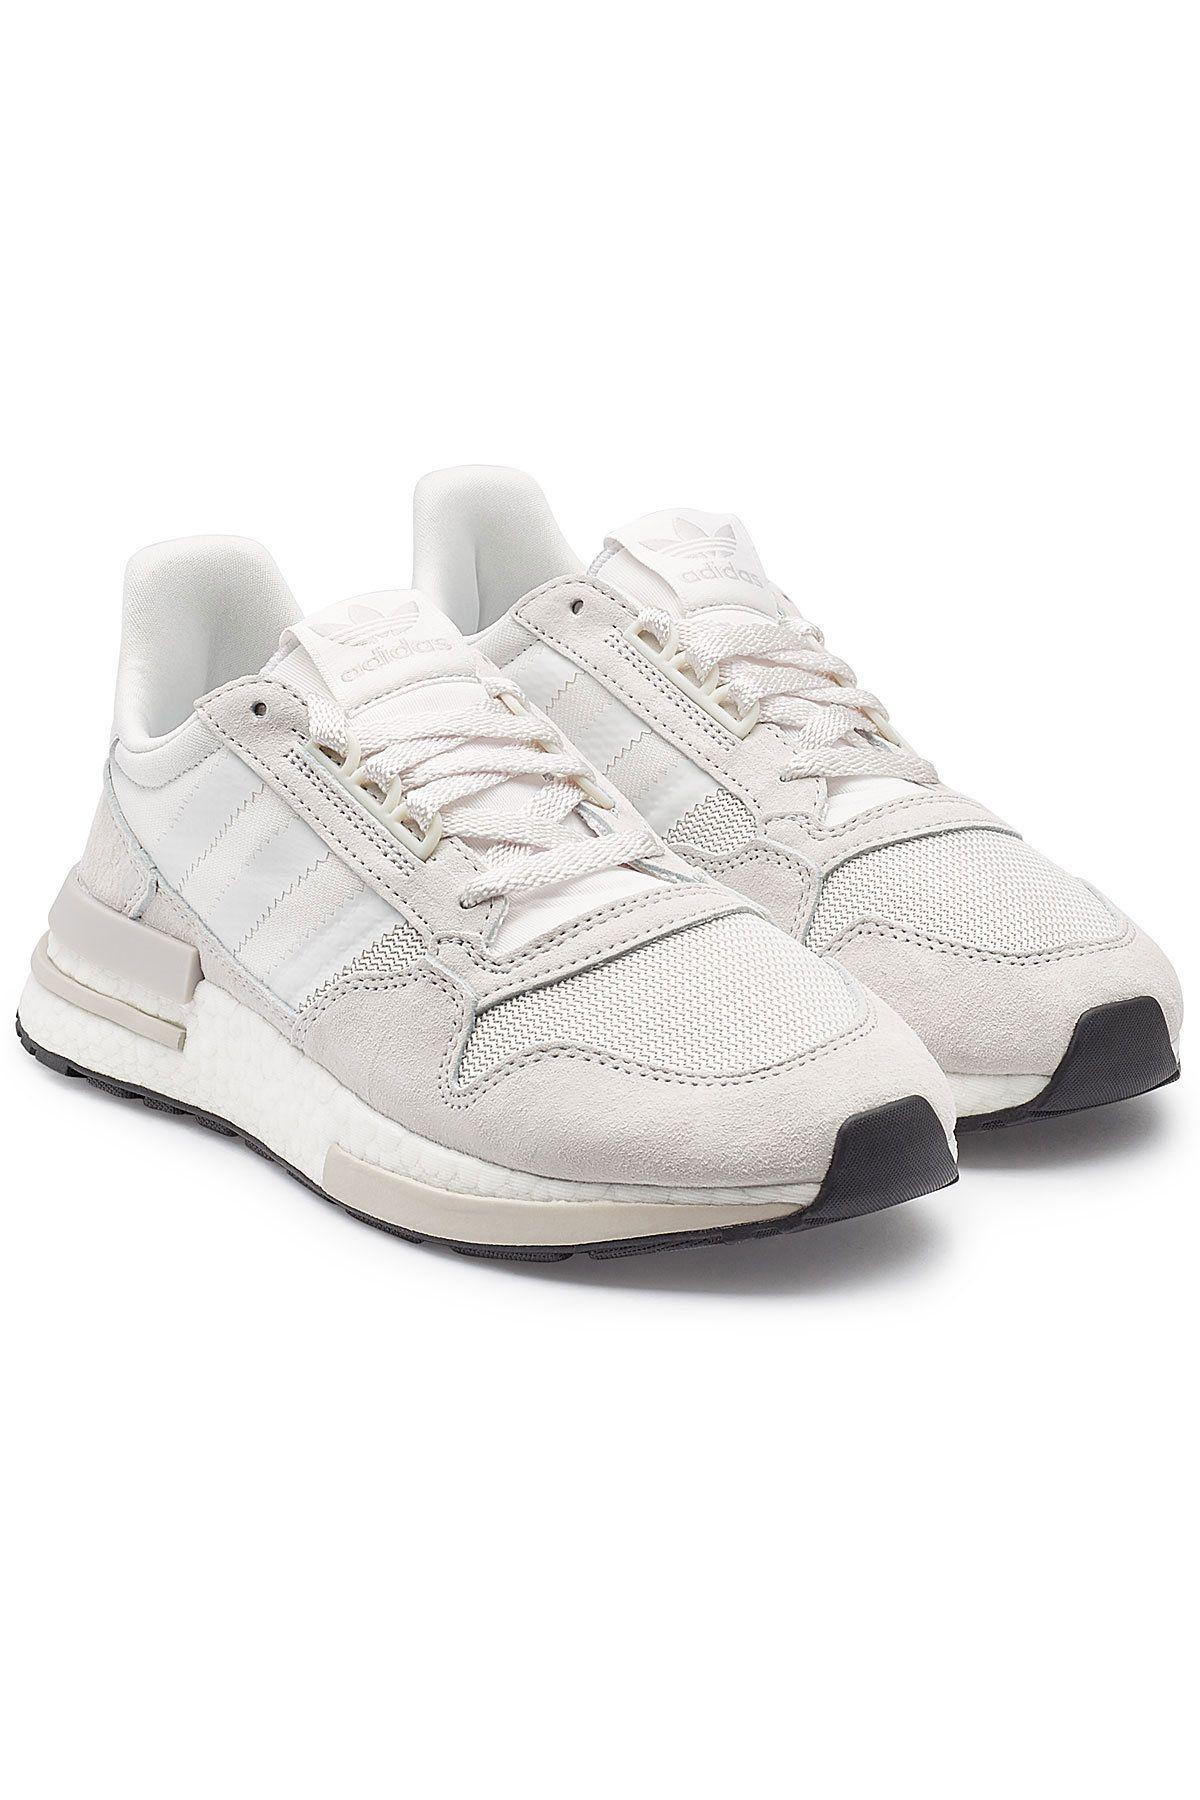 adidas zx 500 grey pink